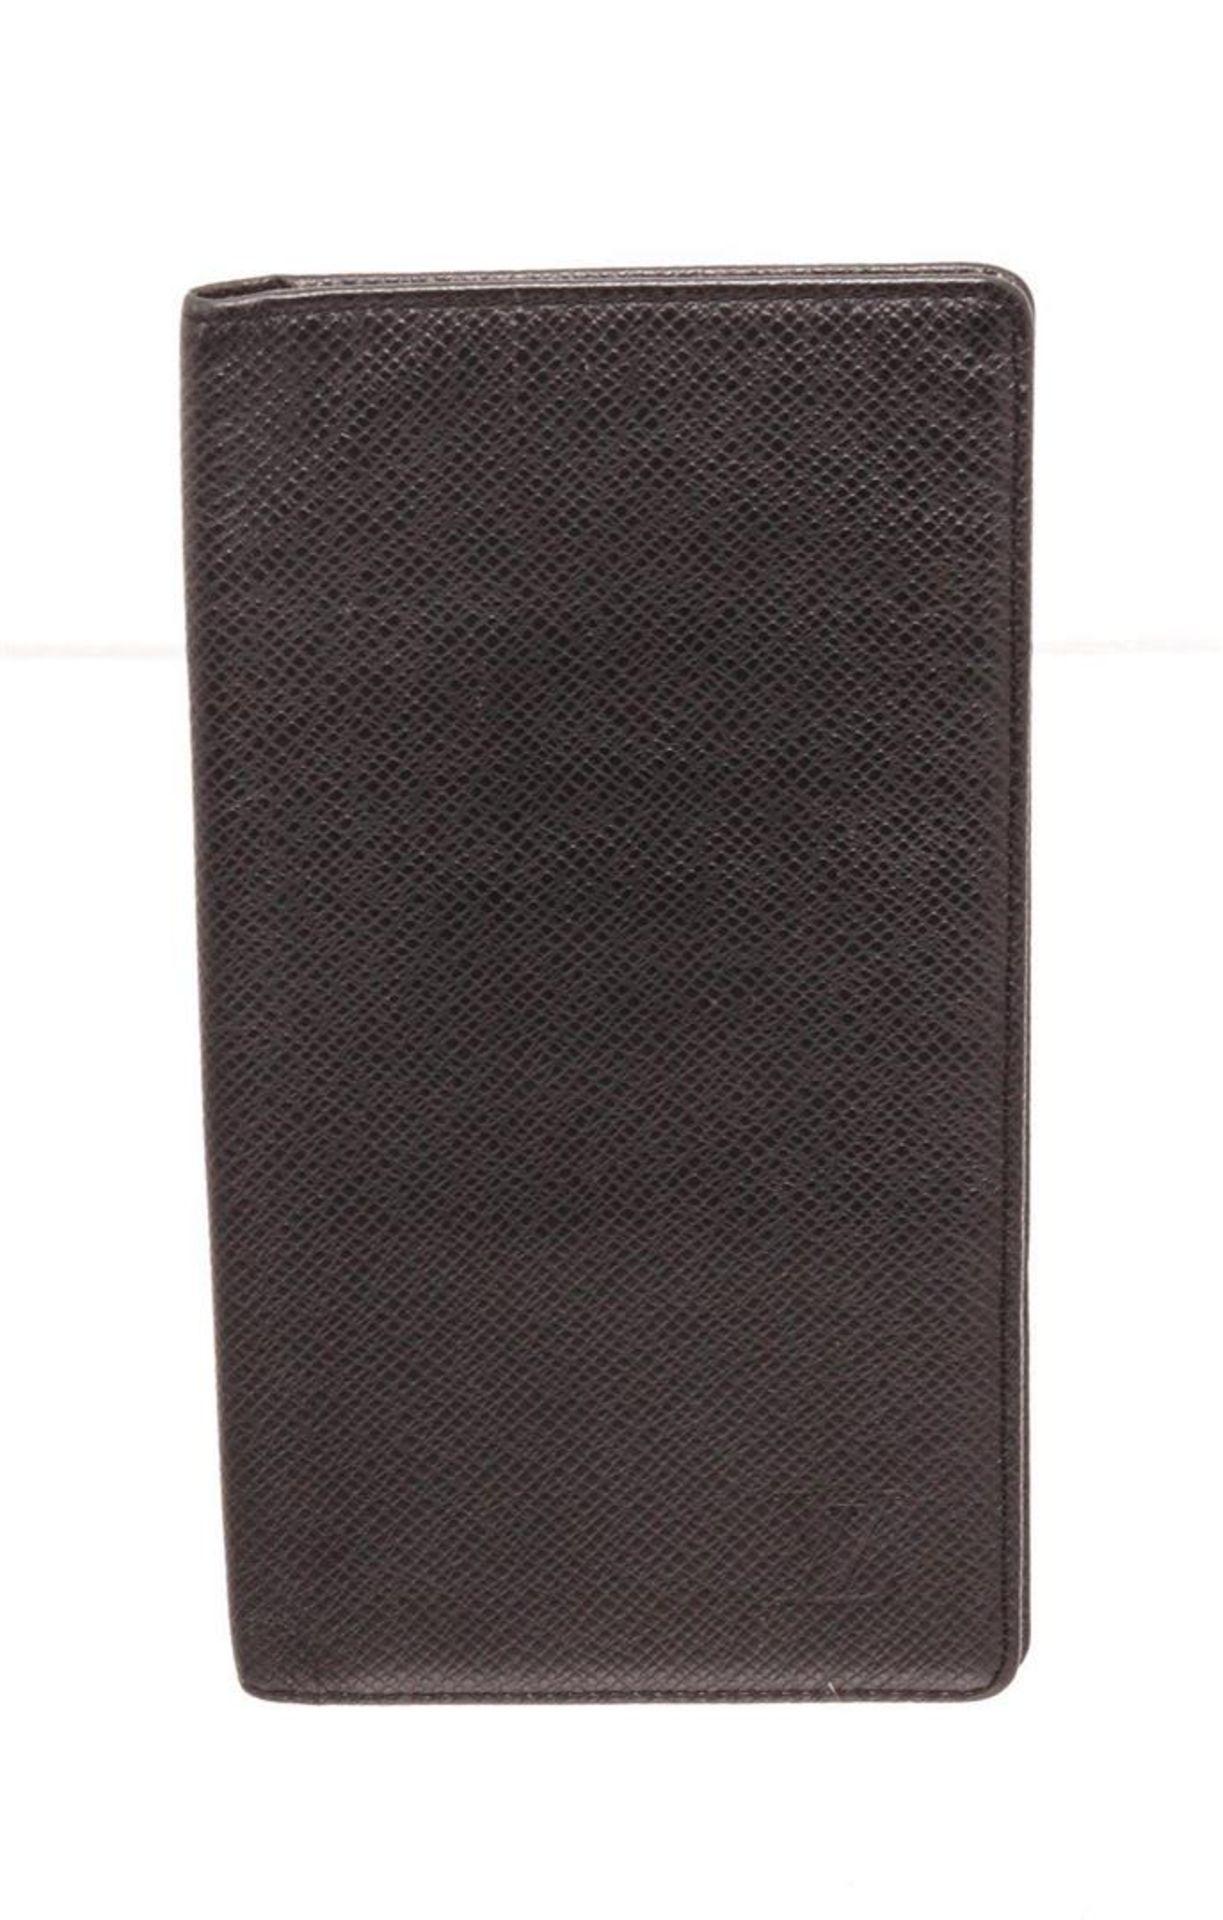 Louis Vuitton Black Monogram Long Card Wallet